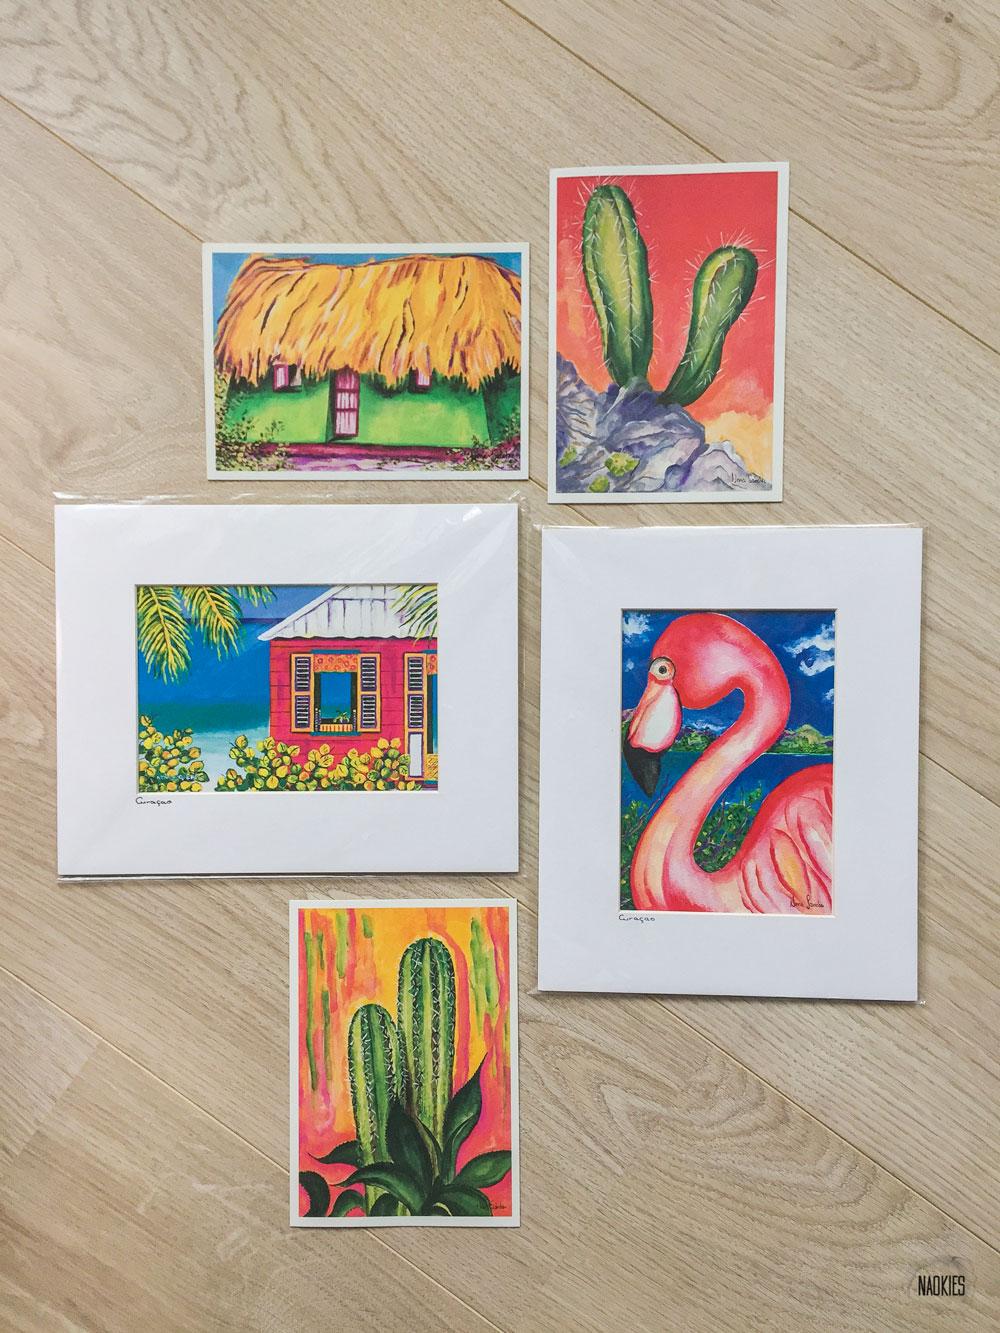 nen-sanchez-kaarten-passe-partout-gallery-curacao-souvenirs-naokies